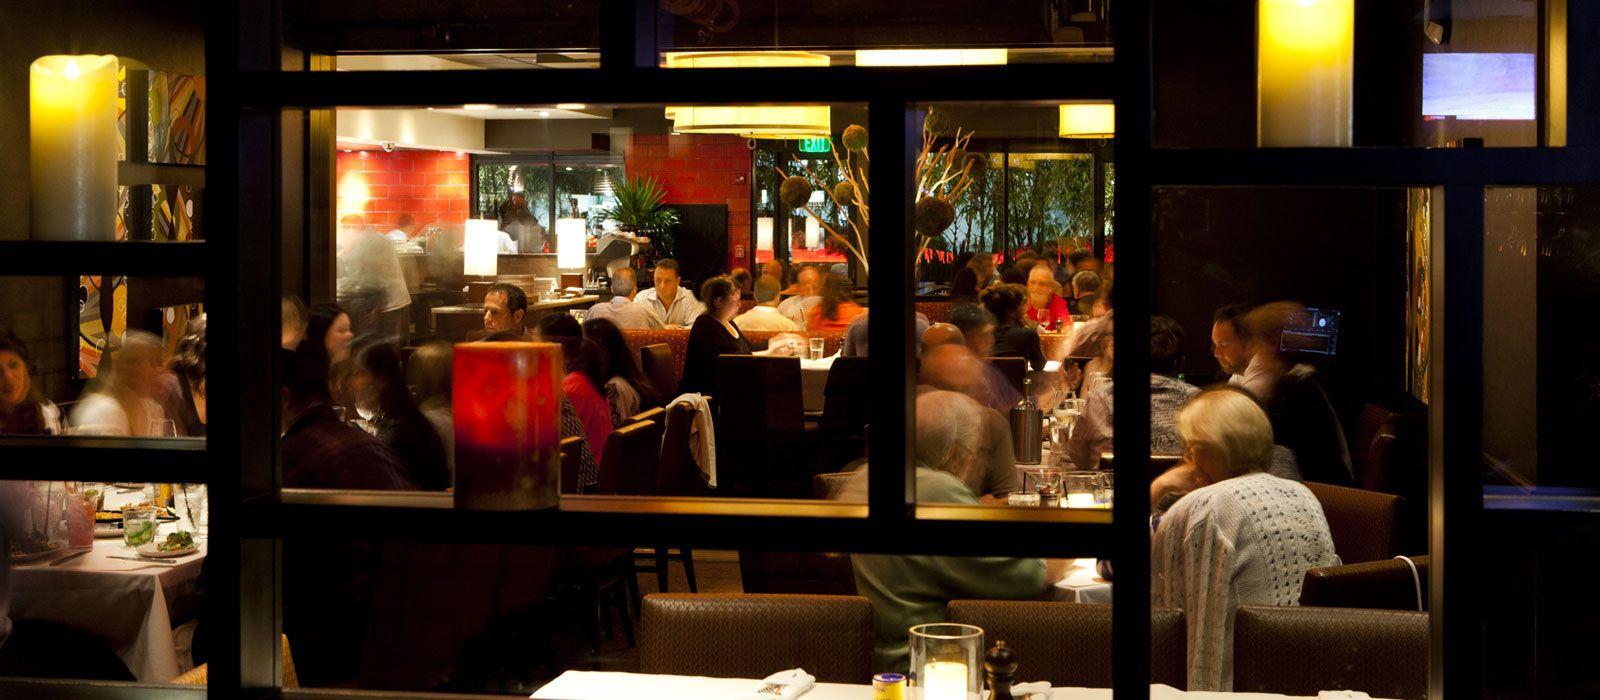 ft lauderdale bars and restaurants